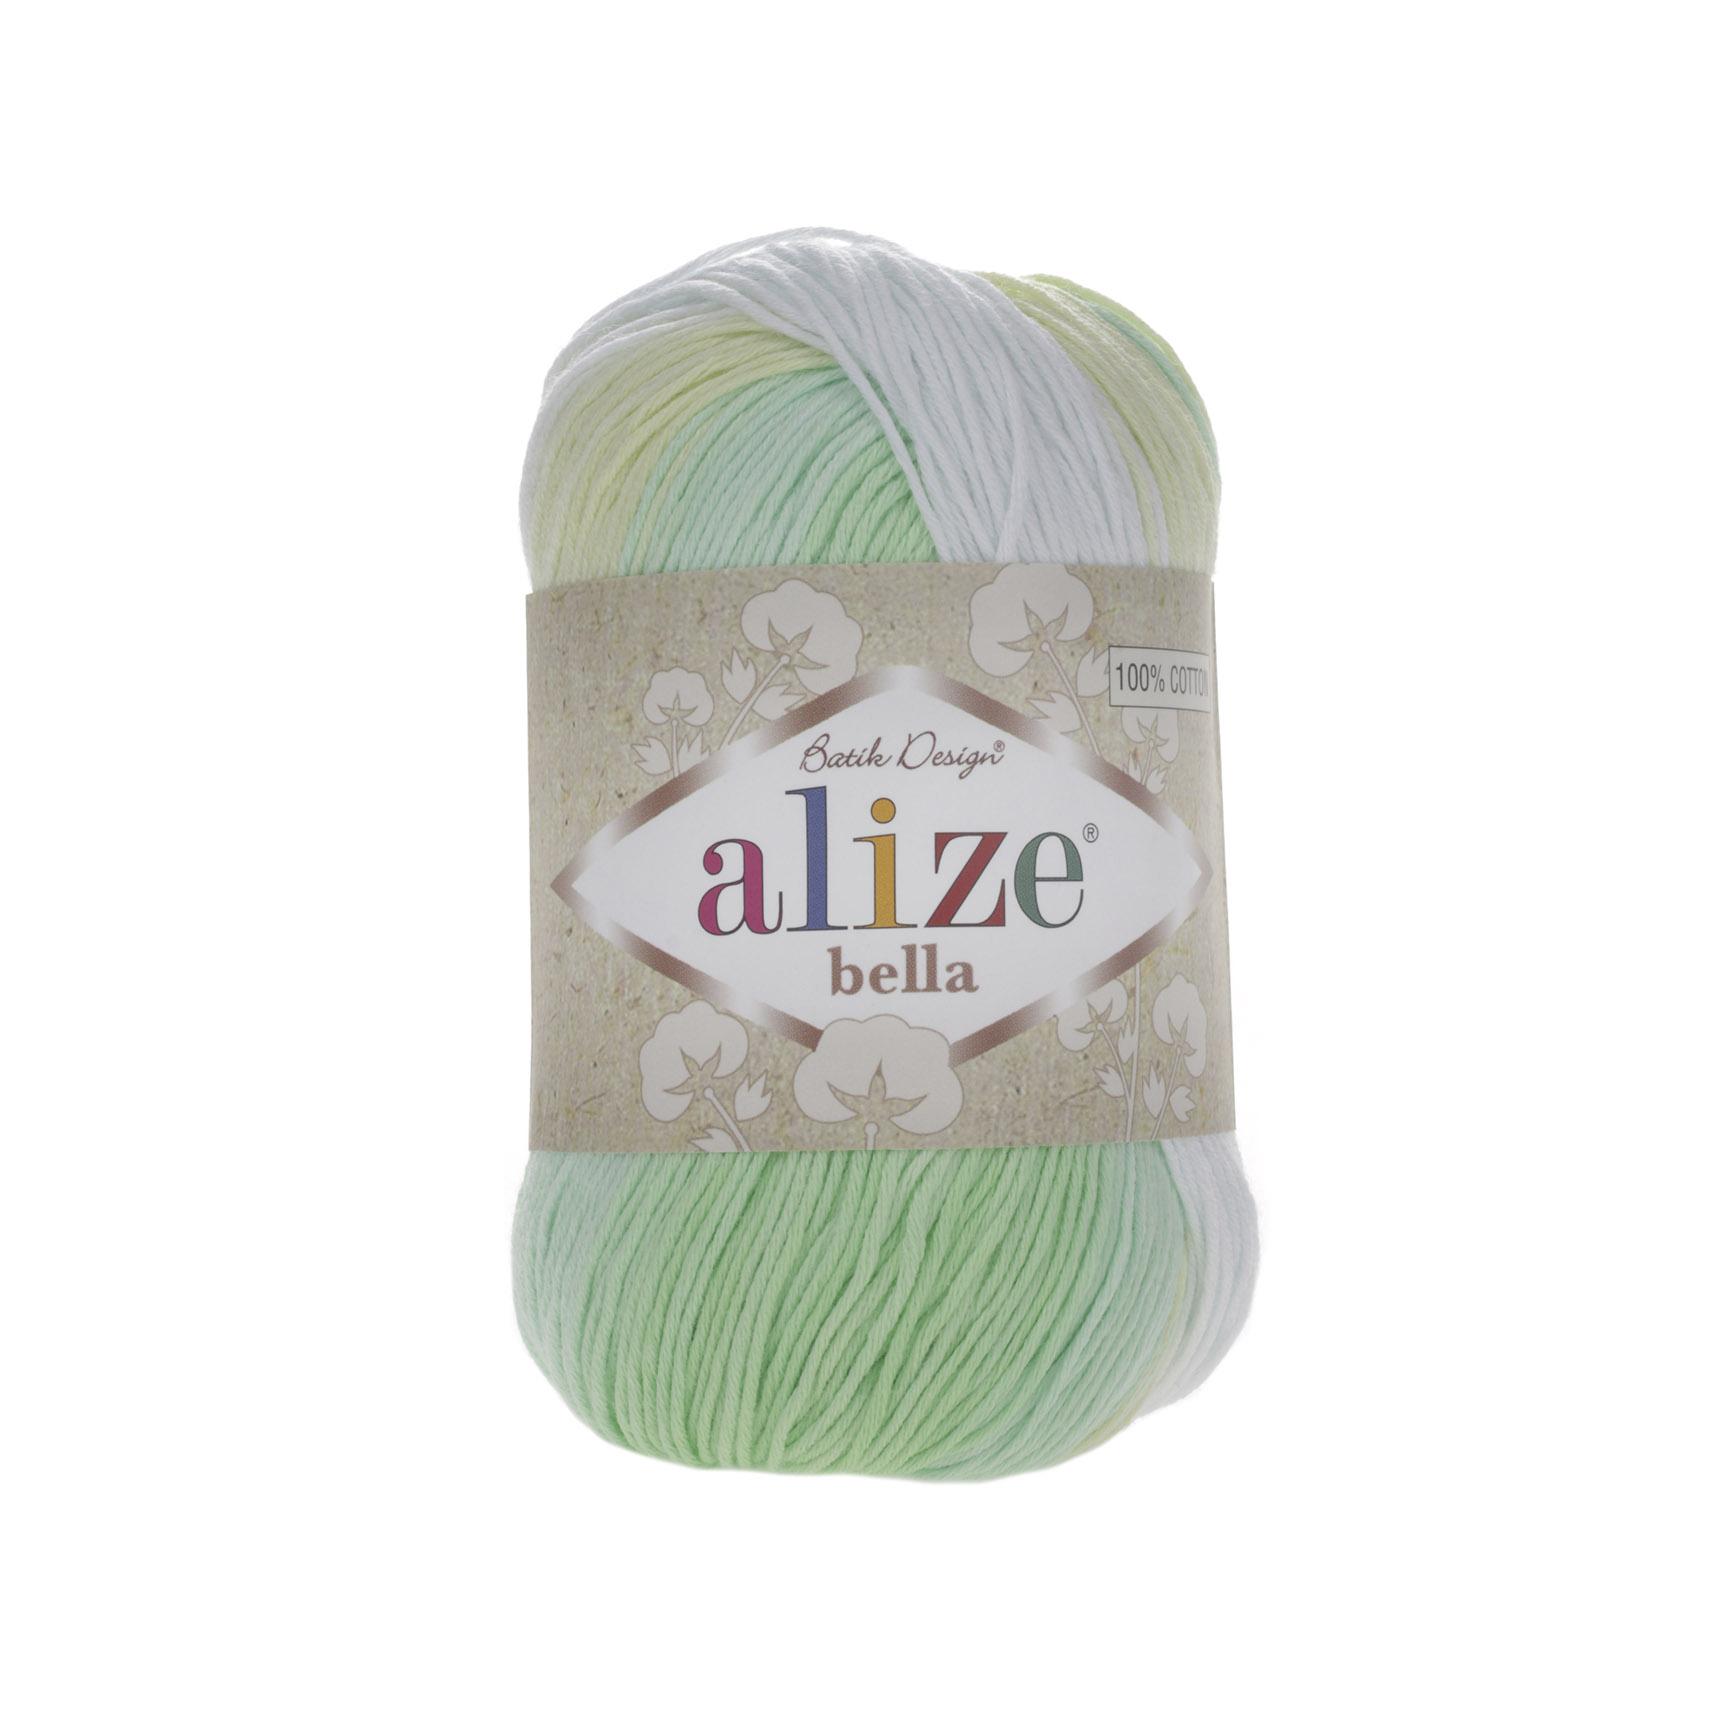 Alize Bella Batik Design COD 2131-0